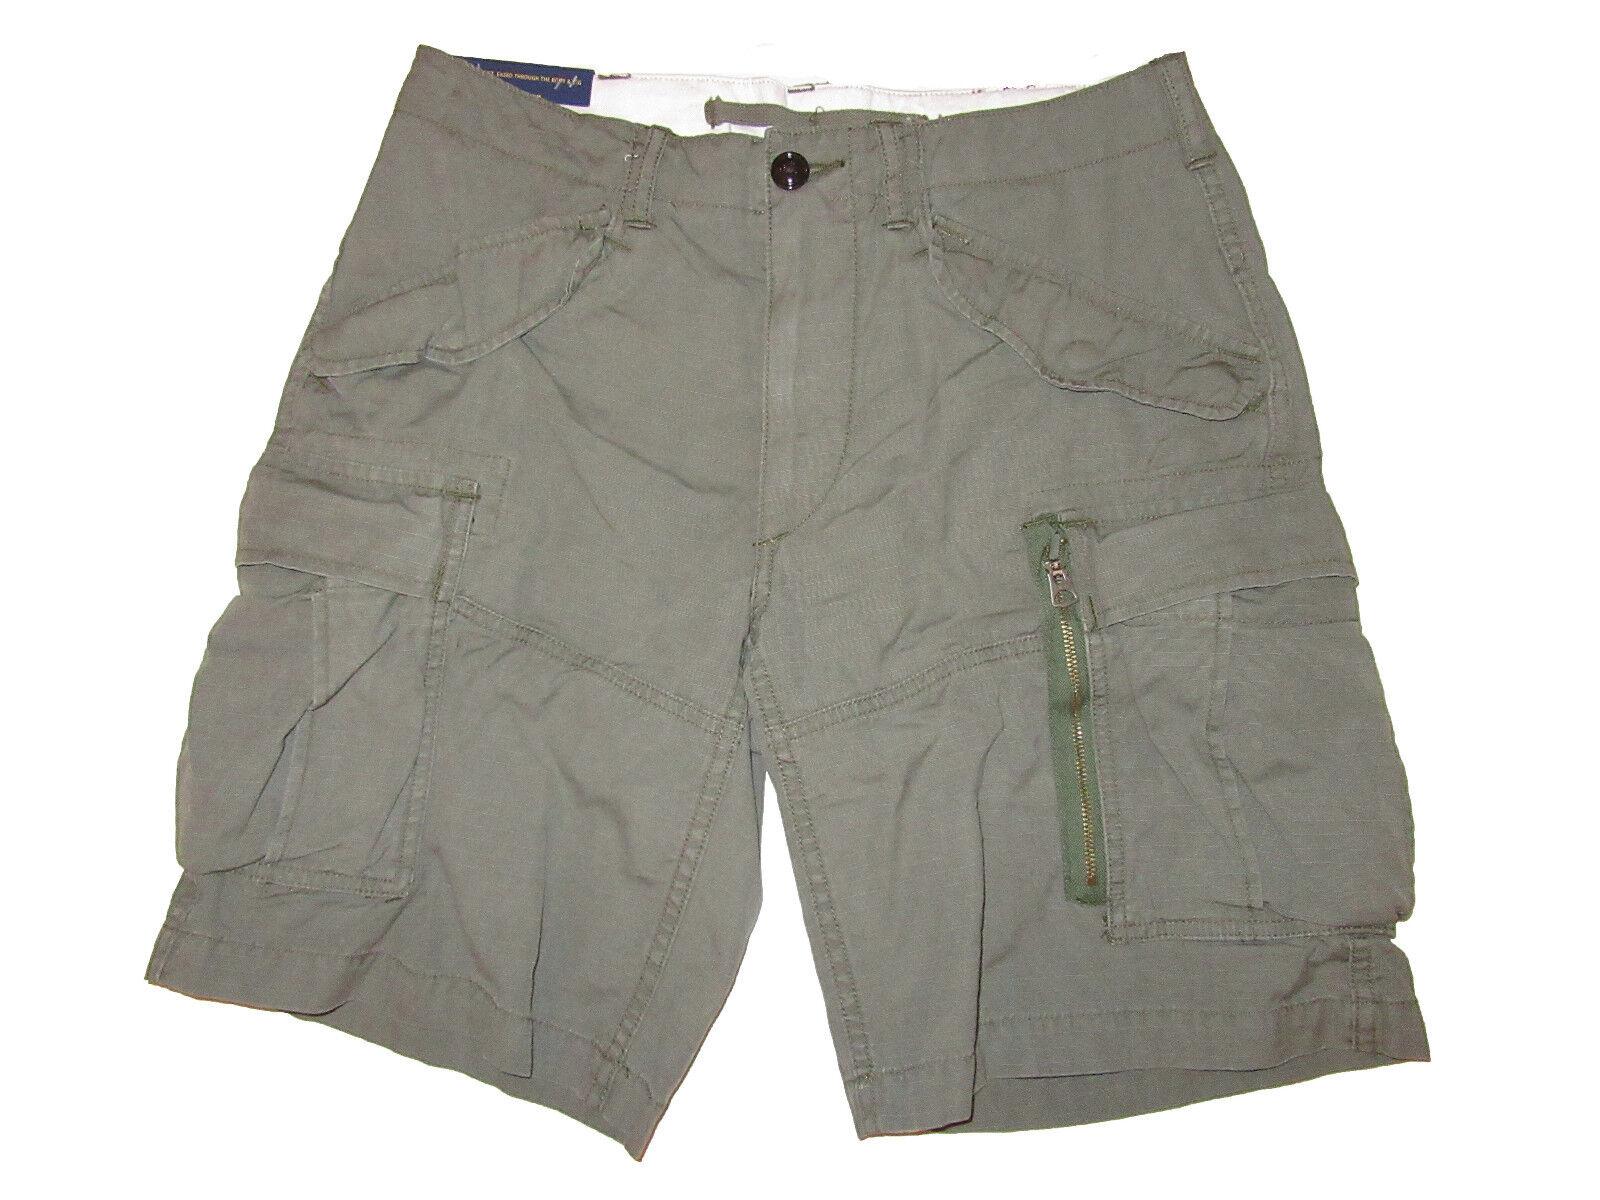 Polo Ralph Lauren Military Green Gunner Cargo Shorts 30